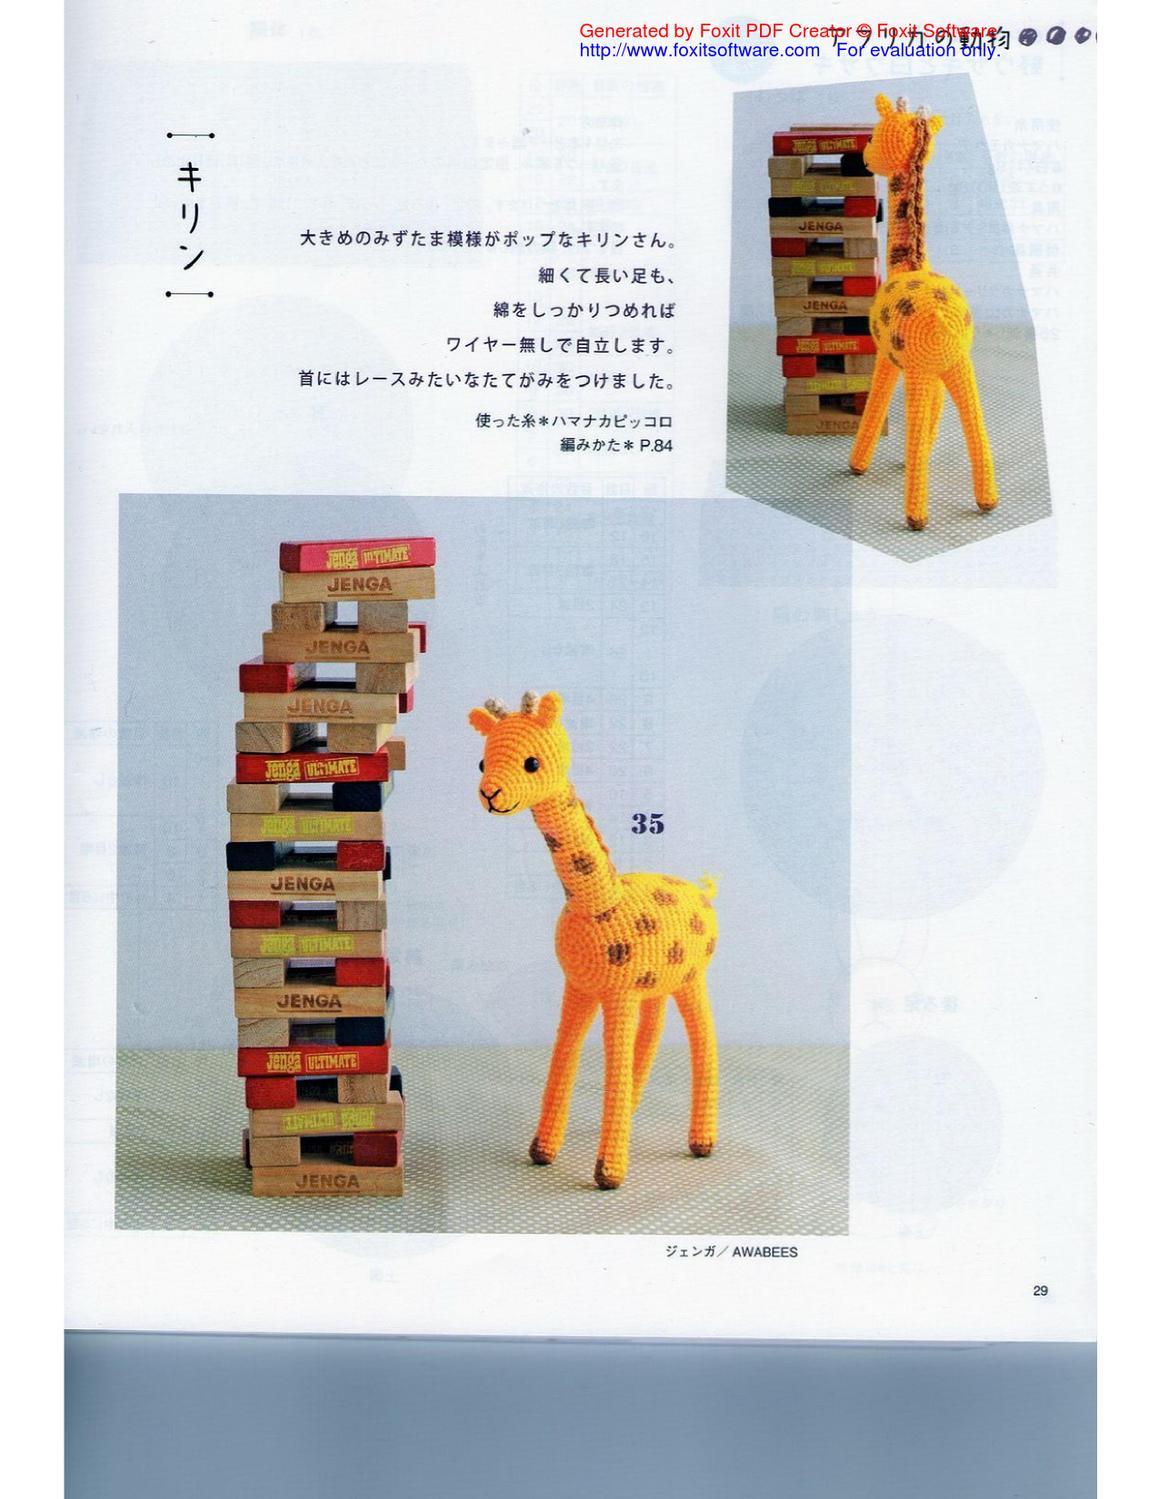 Amigurumi crochet giraffe pattern | Jirafa amigurumi, Amigurumi ... | 1499x1159